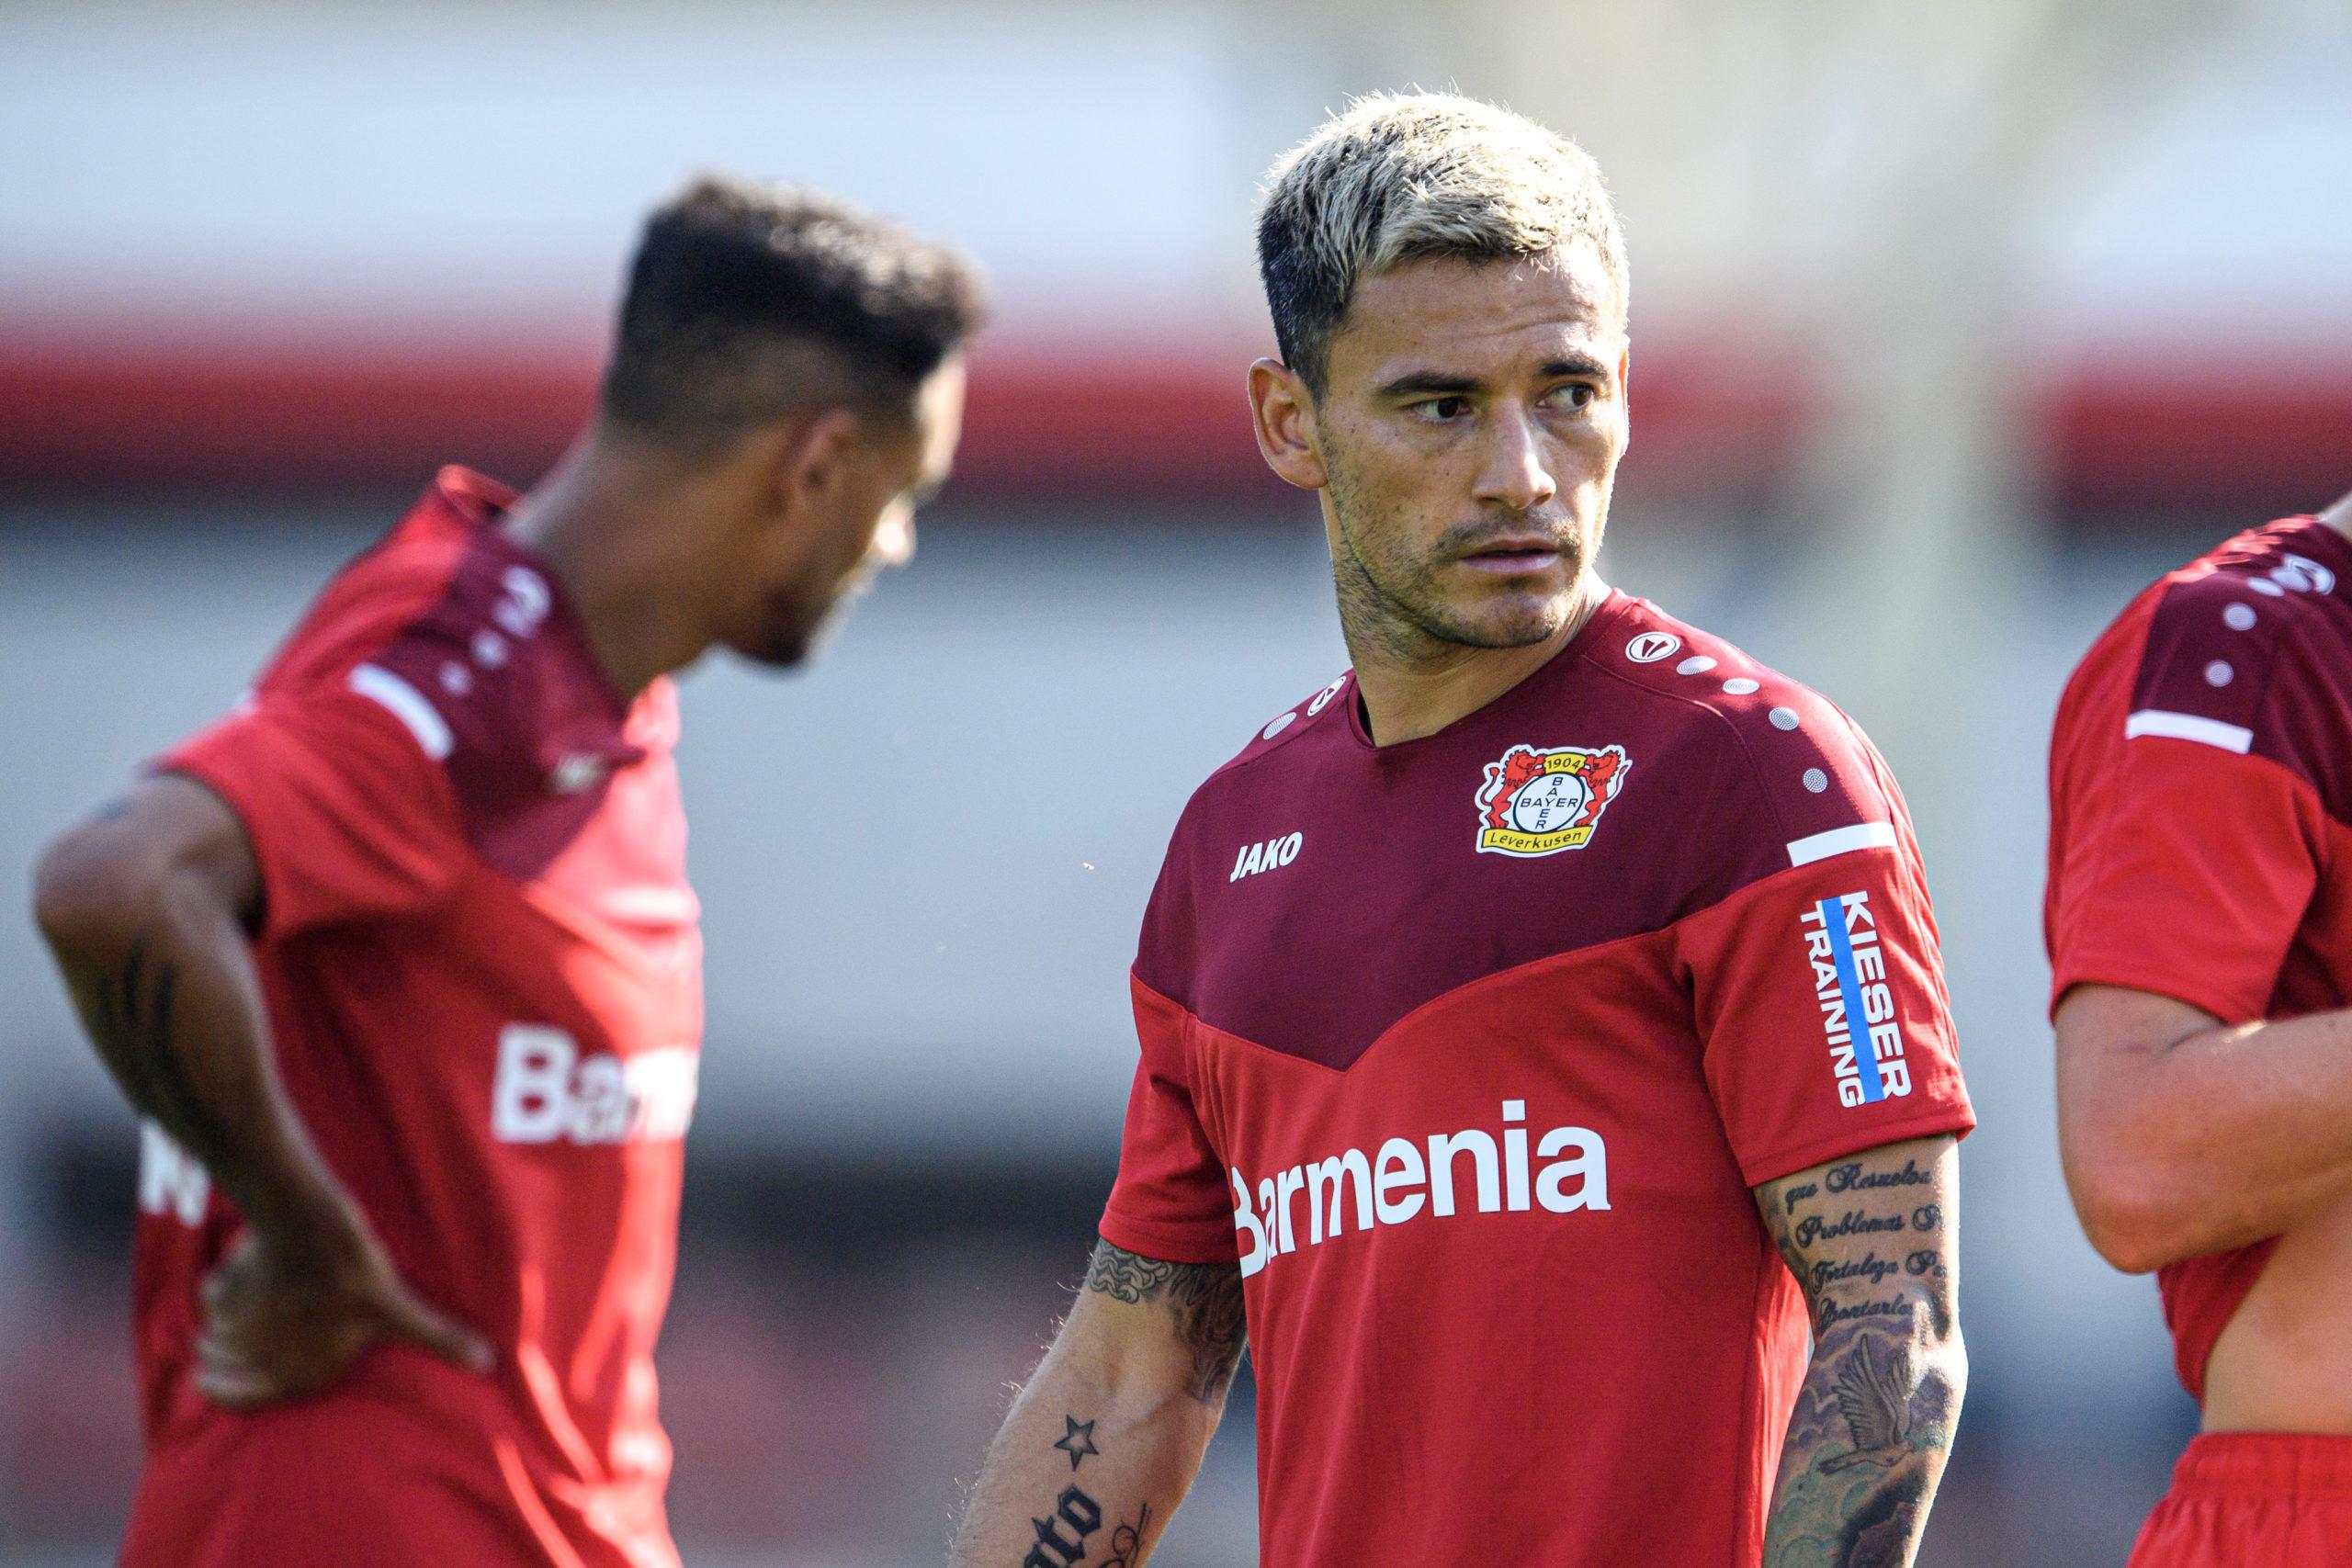 Bundesliga Preview 2020/21: Matchday 1